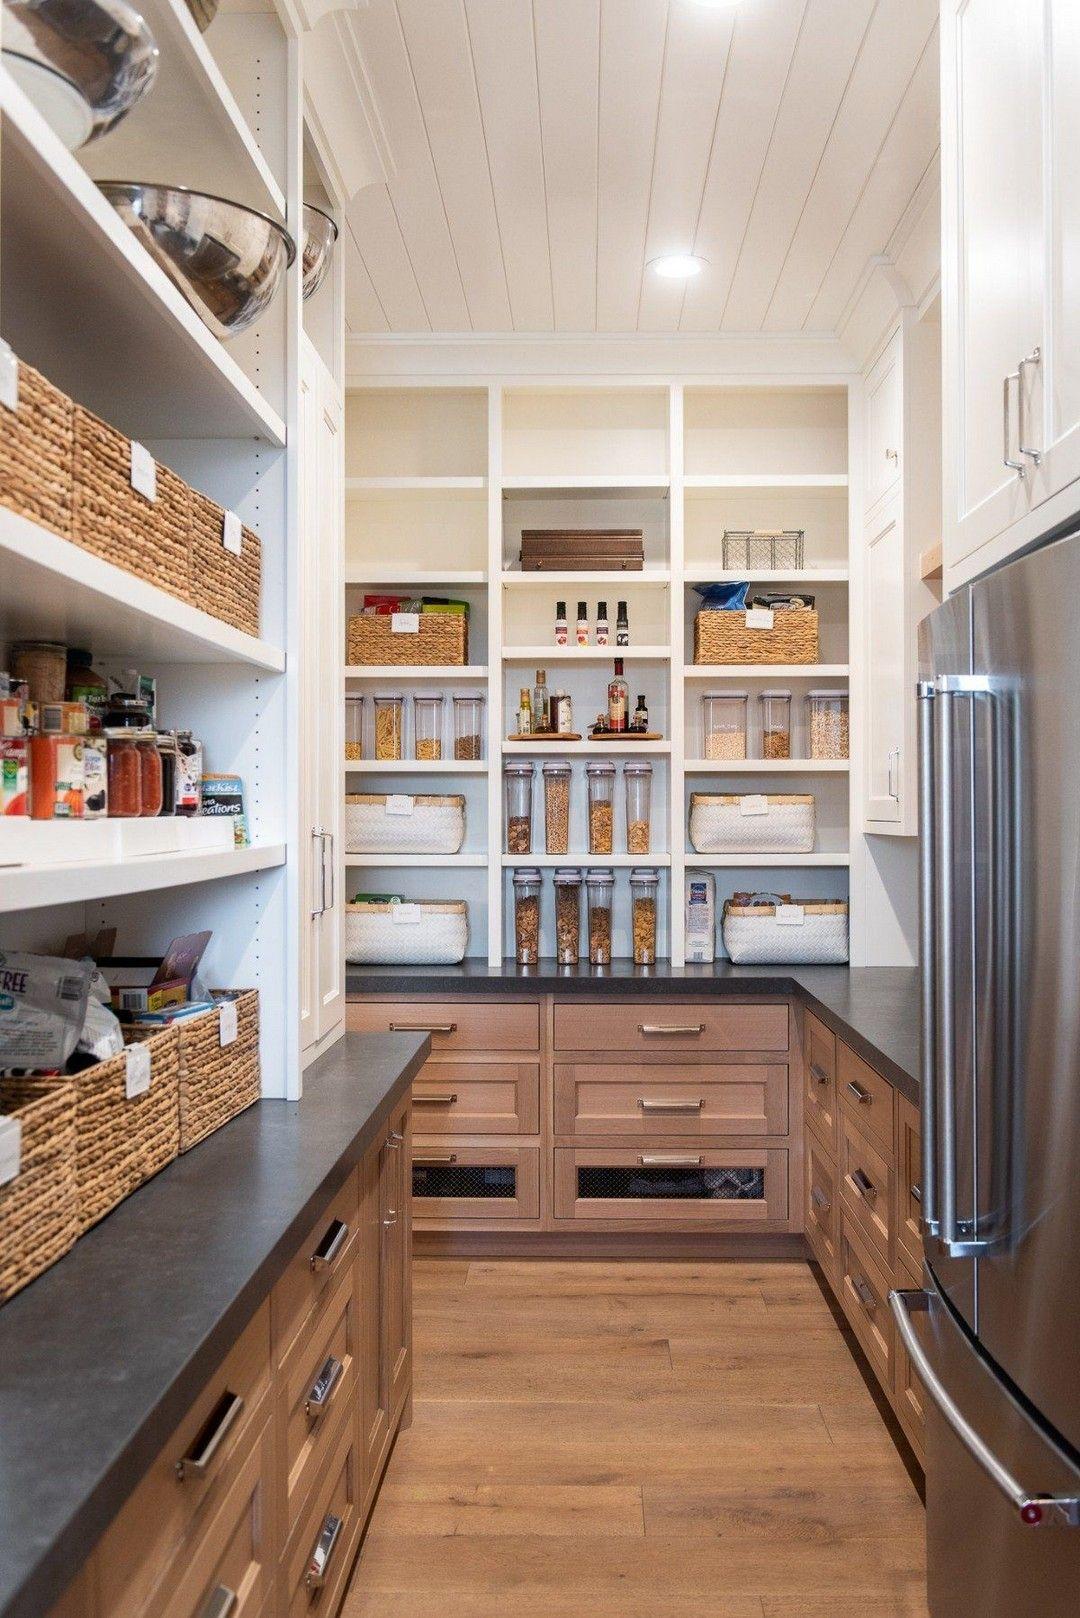 81 Diy Organized Walk In Modern Farmhouse Butler S Pantry Farmhouse Room Kitchen Pantry Design Pantry Design Pantry Room